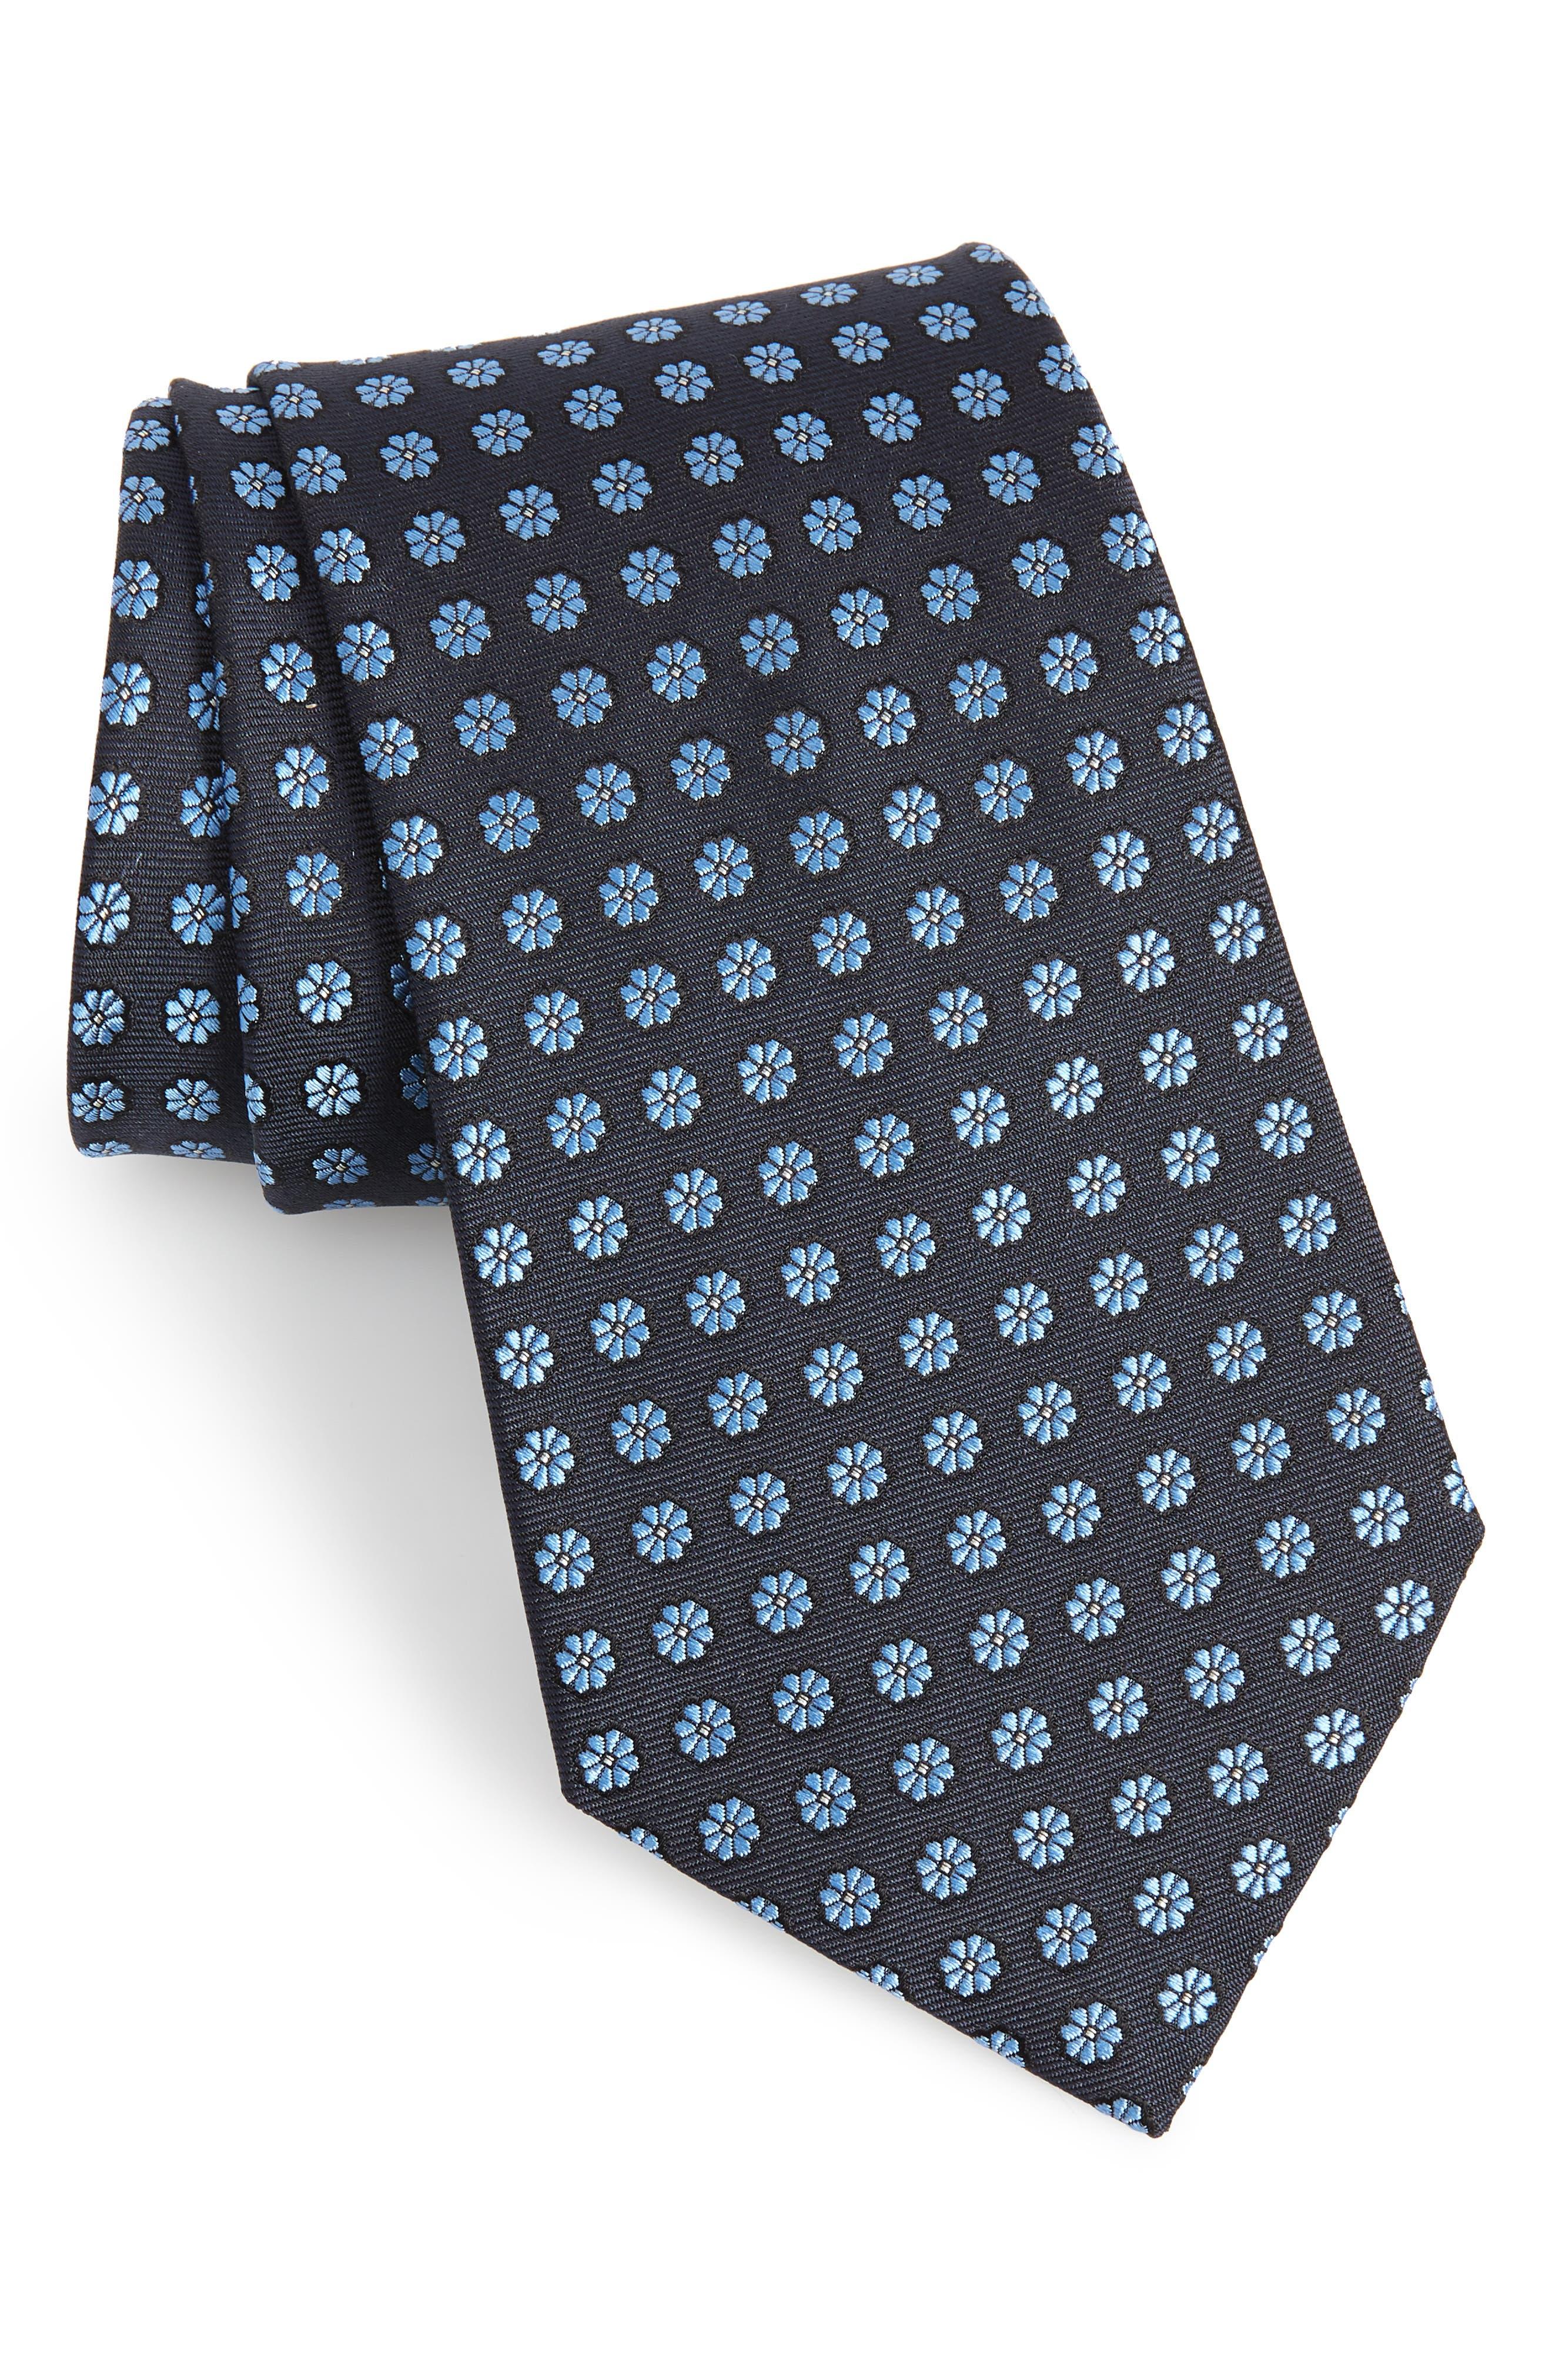 ERMENEGILDO ZEGNA, Floral Silk Tie, Main thumbnail 1, color, BLUE/ NAVY